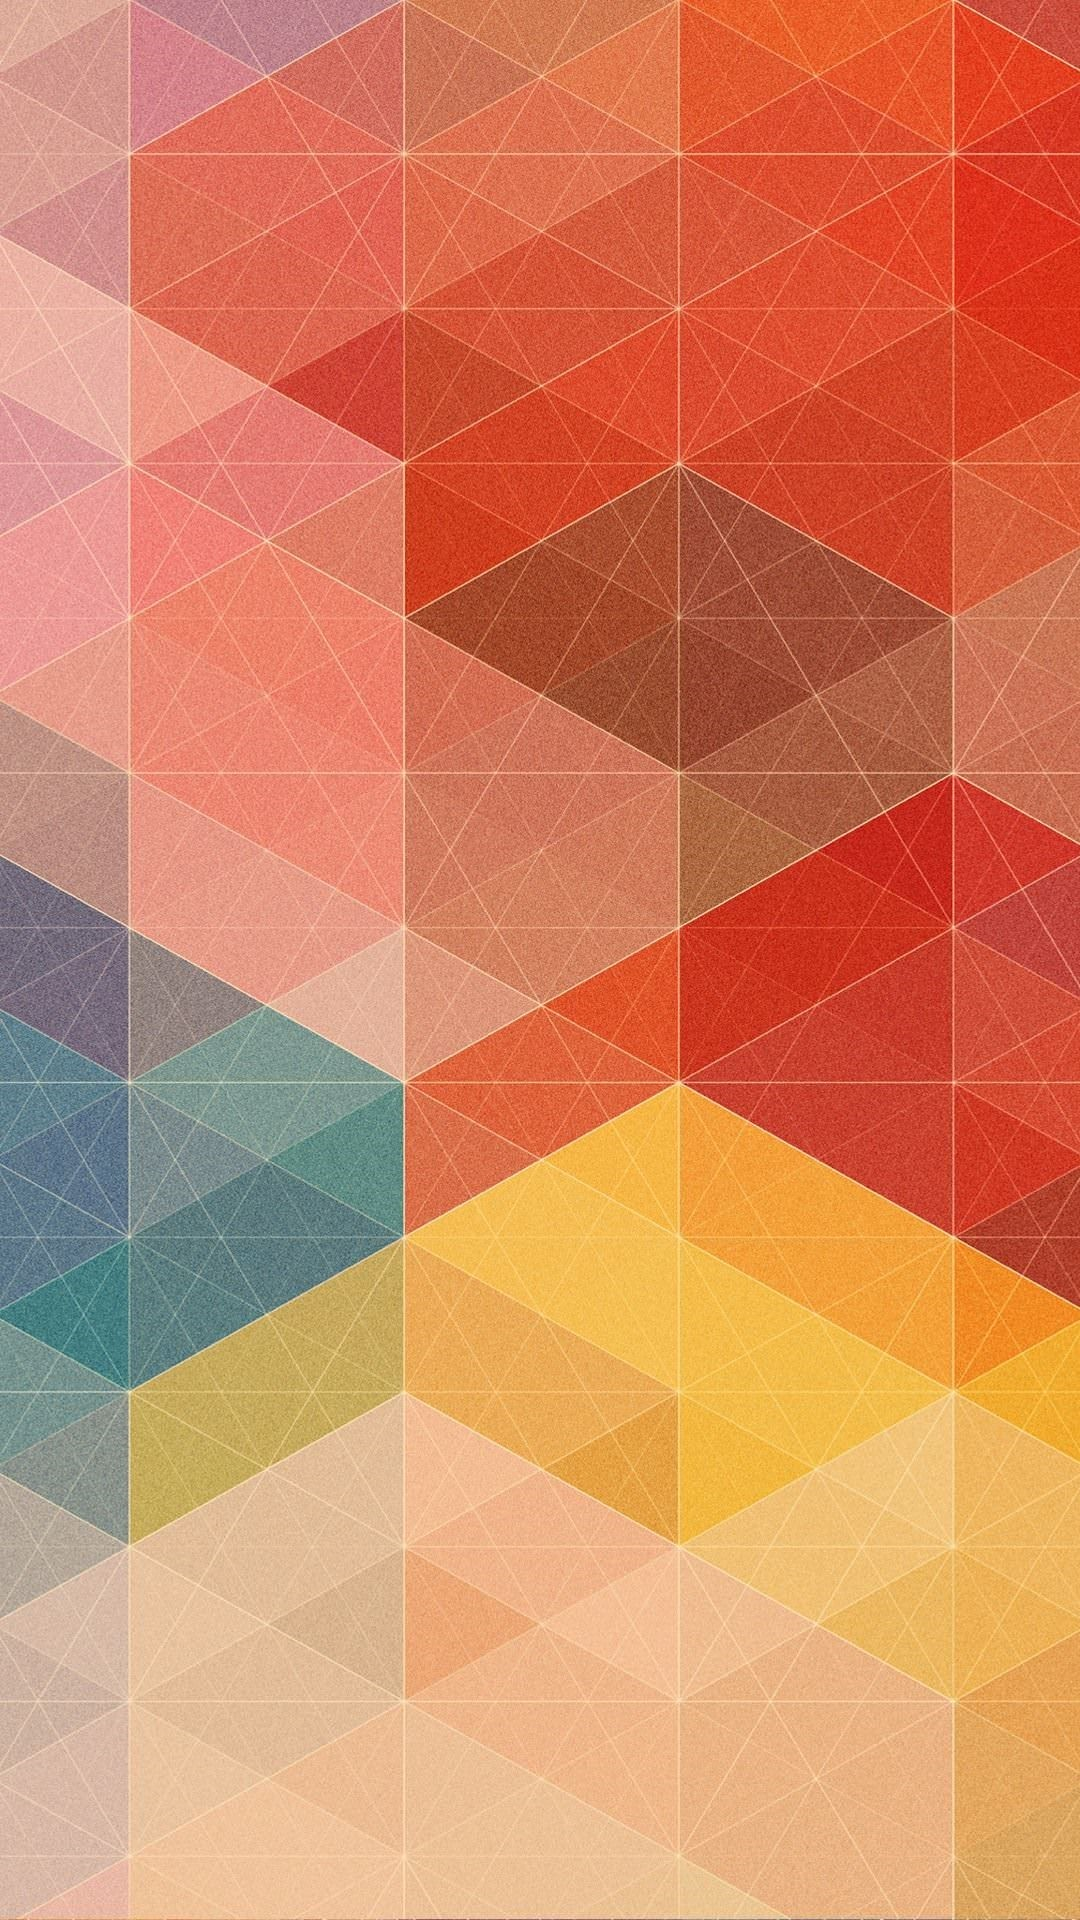 Geometric iphone wallpaper high quality